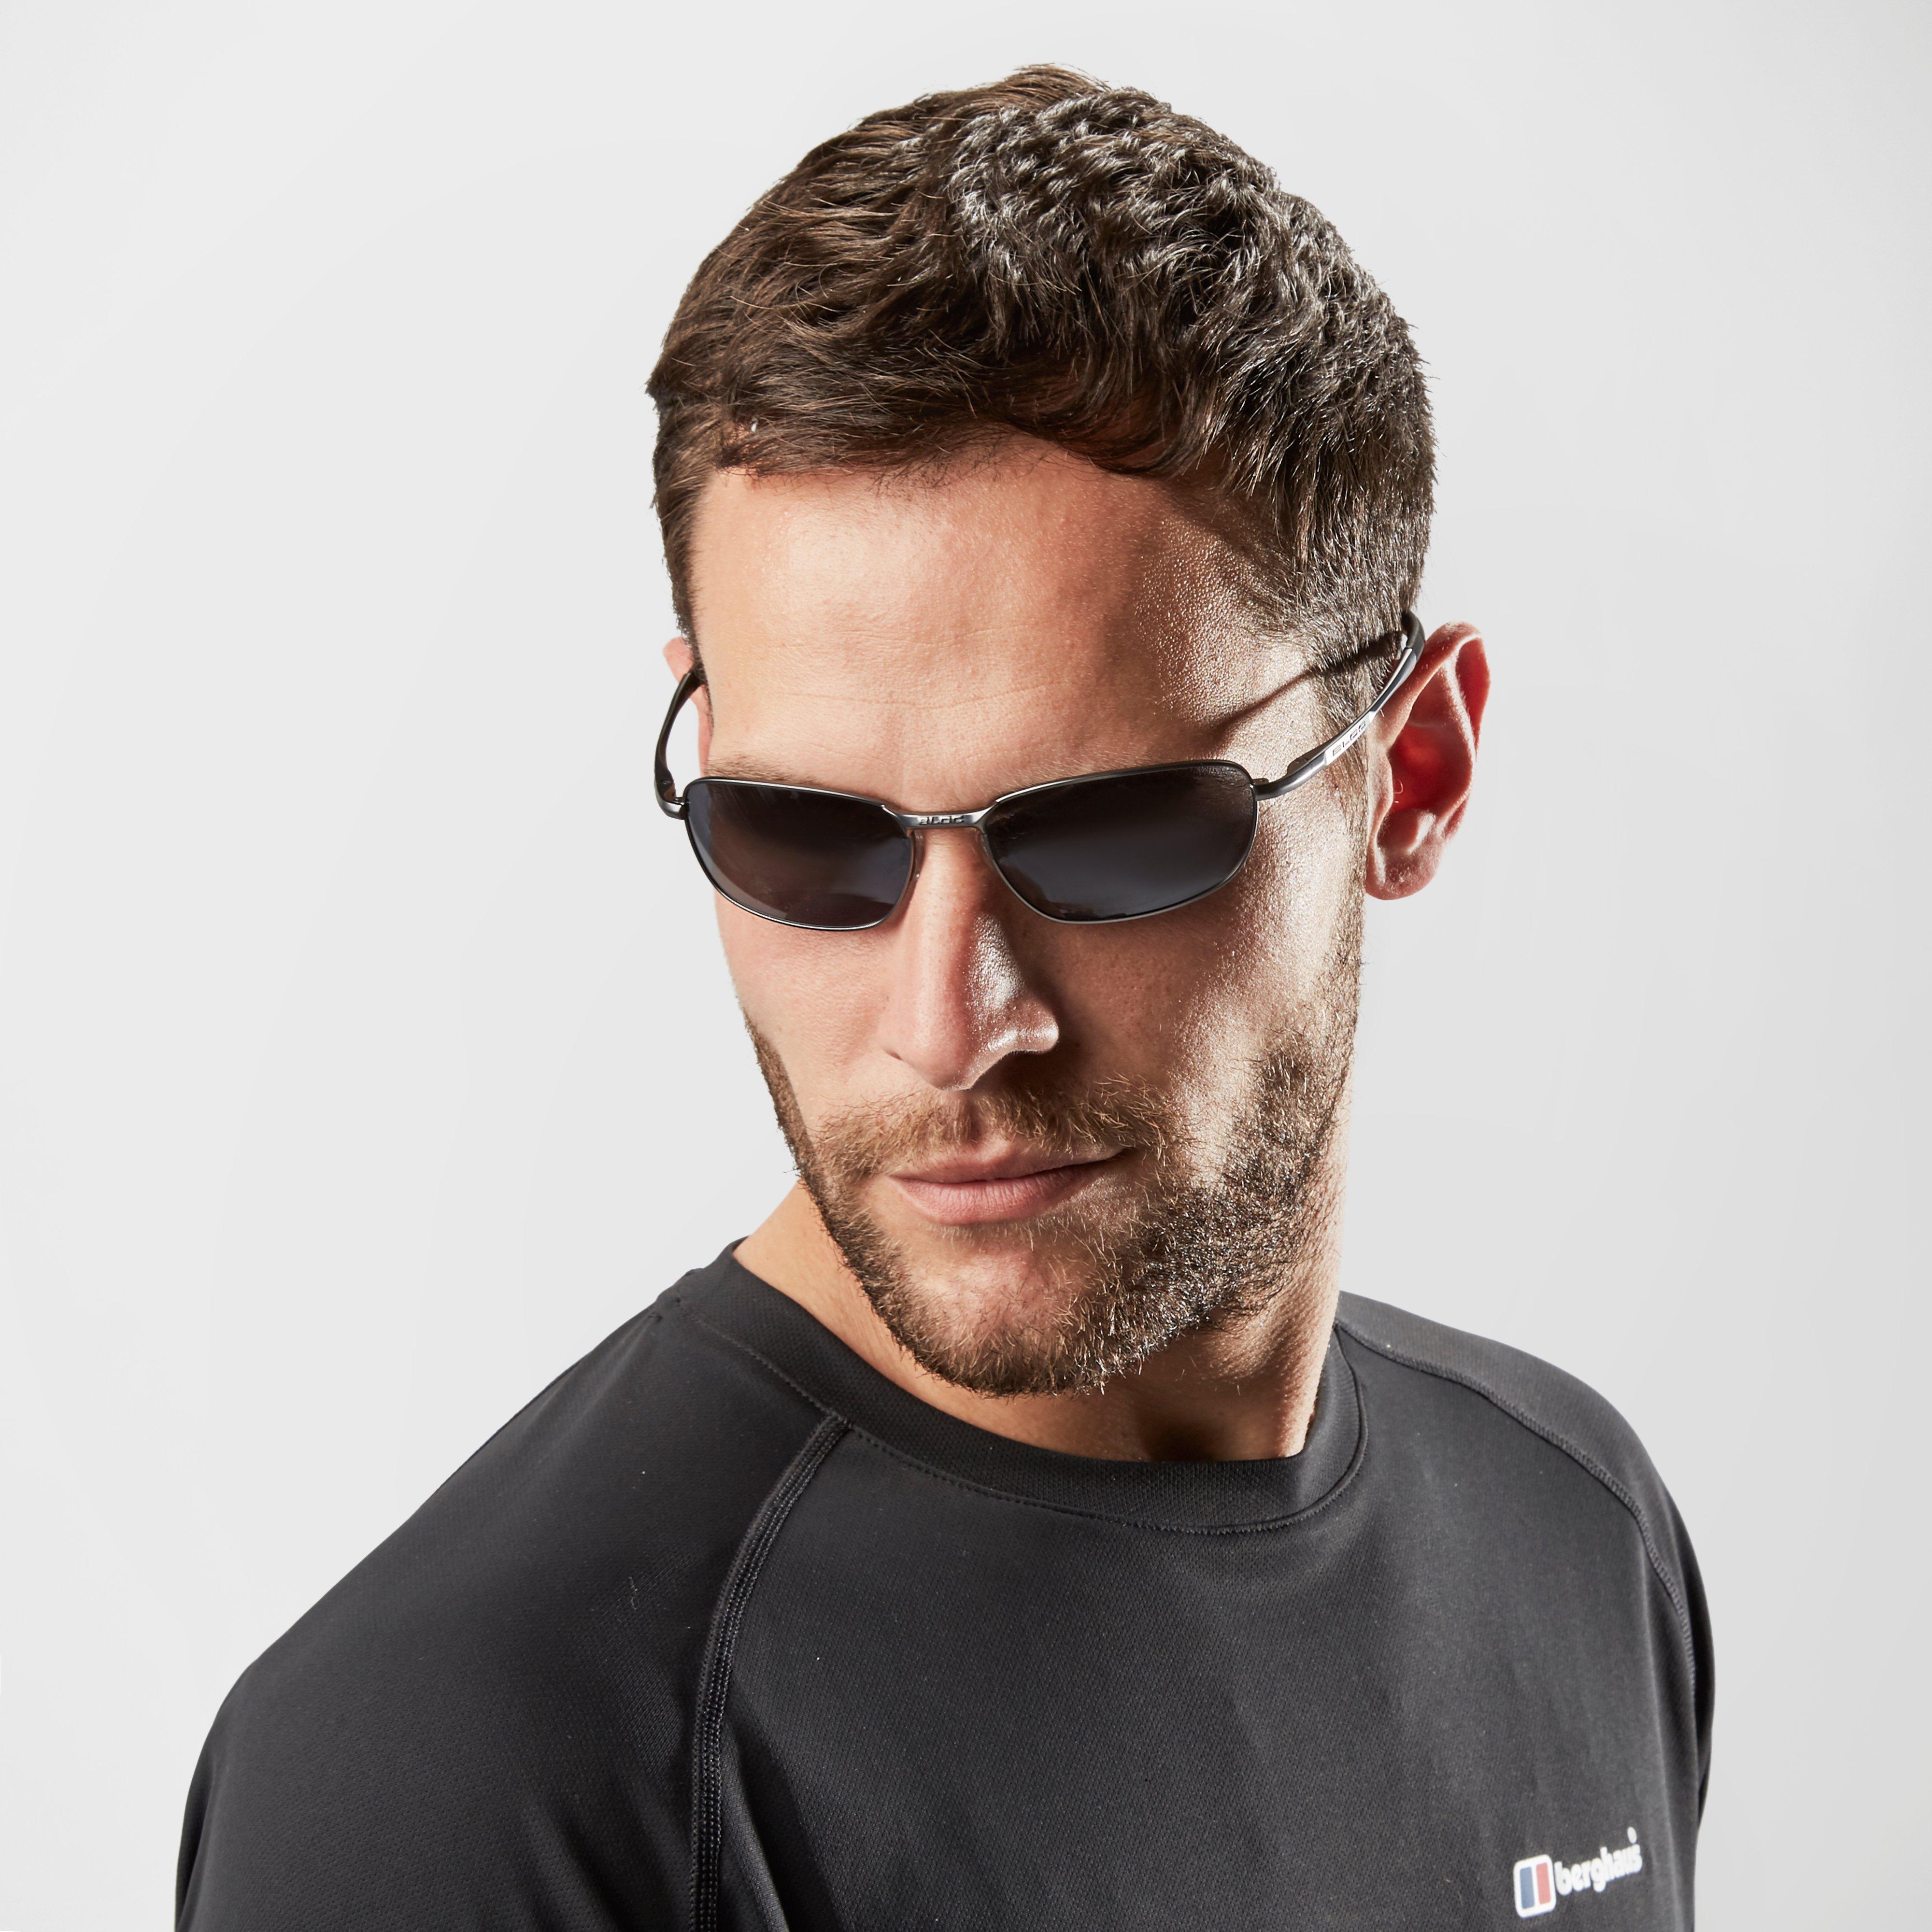 Bloc Pluto P330 Sunglasses - Grey/gry  Grey/gry